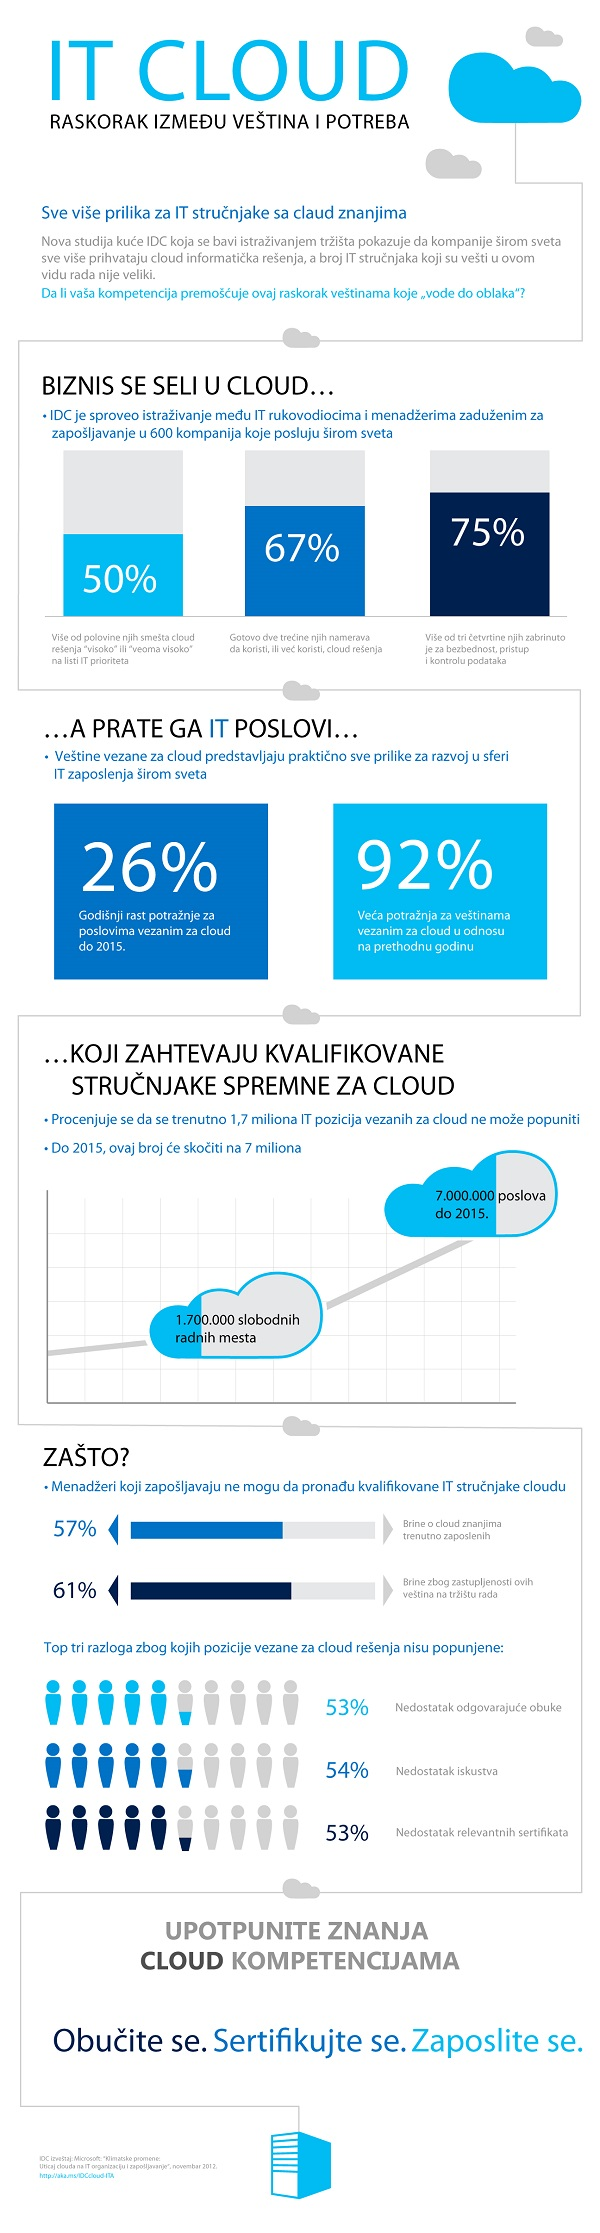 infografik rasta cloud poslovanja